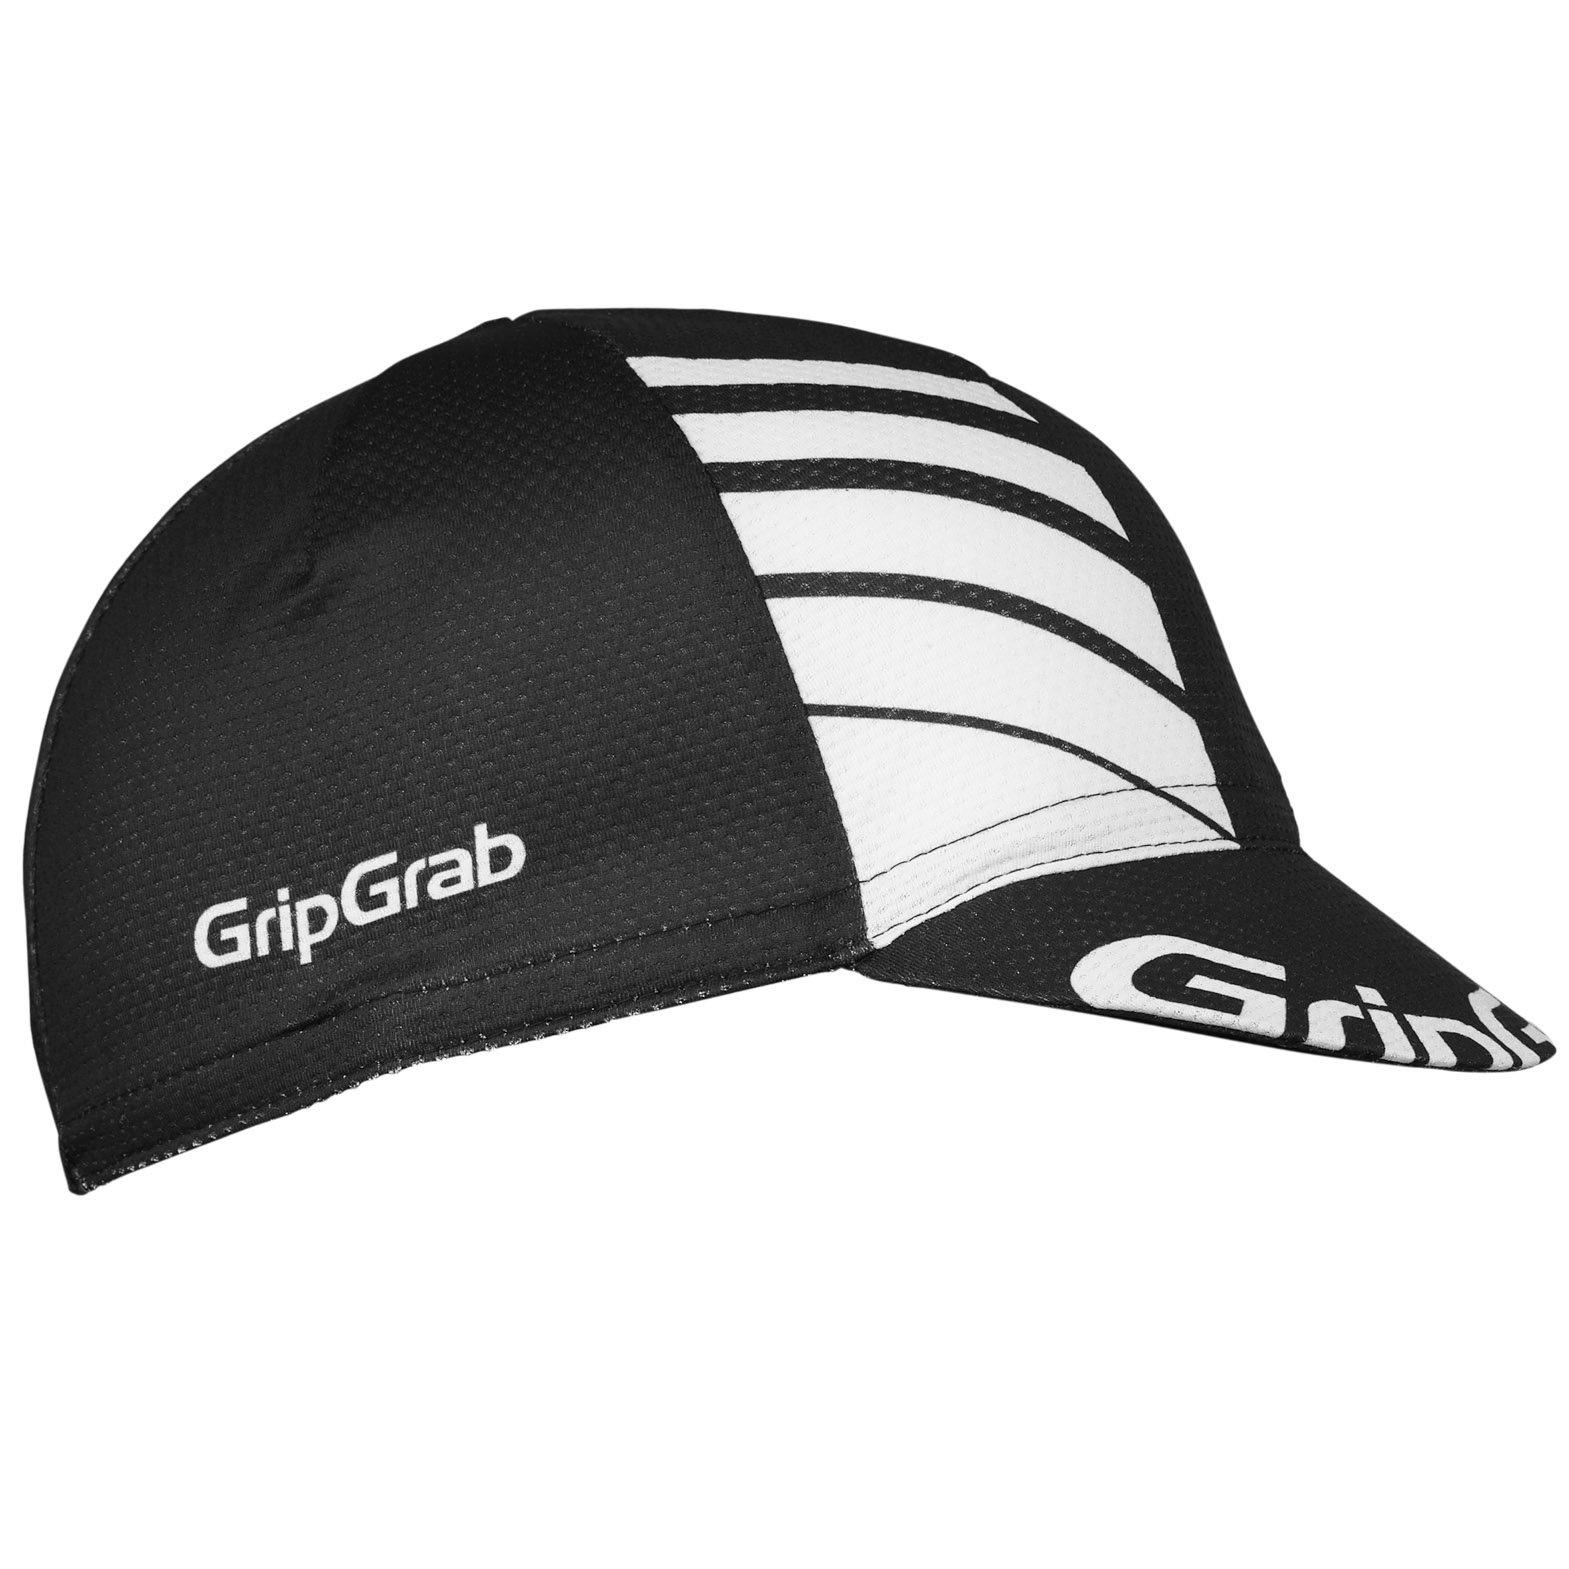 GripGrab Summer Cycling Cap Letvægts - Sort